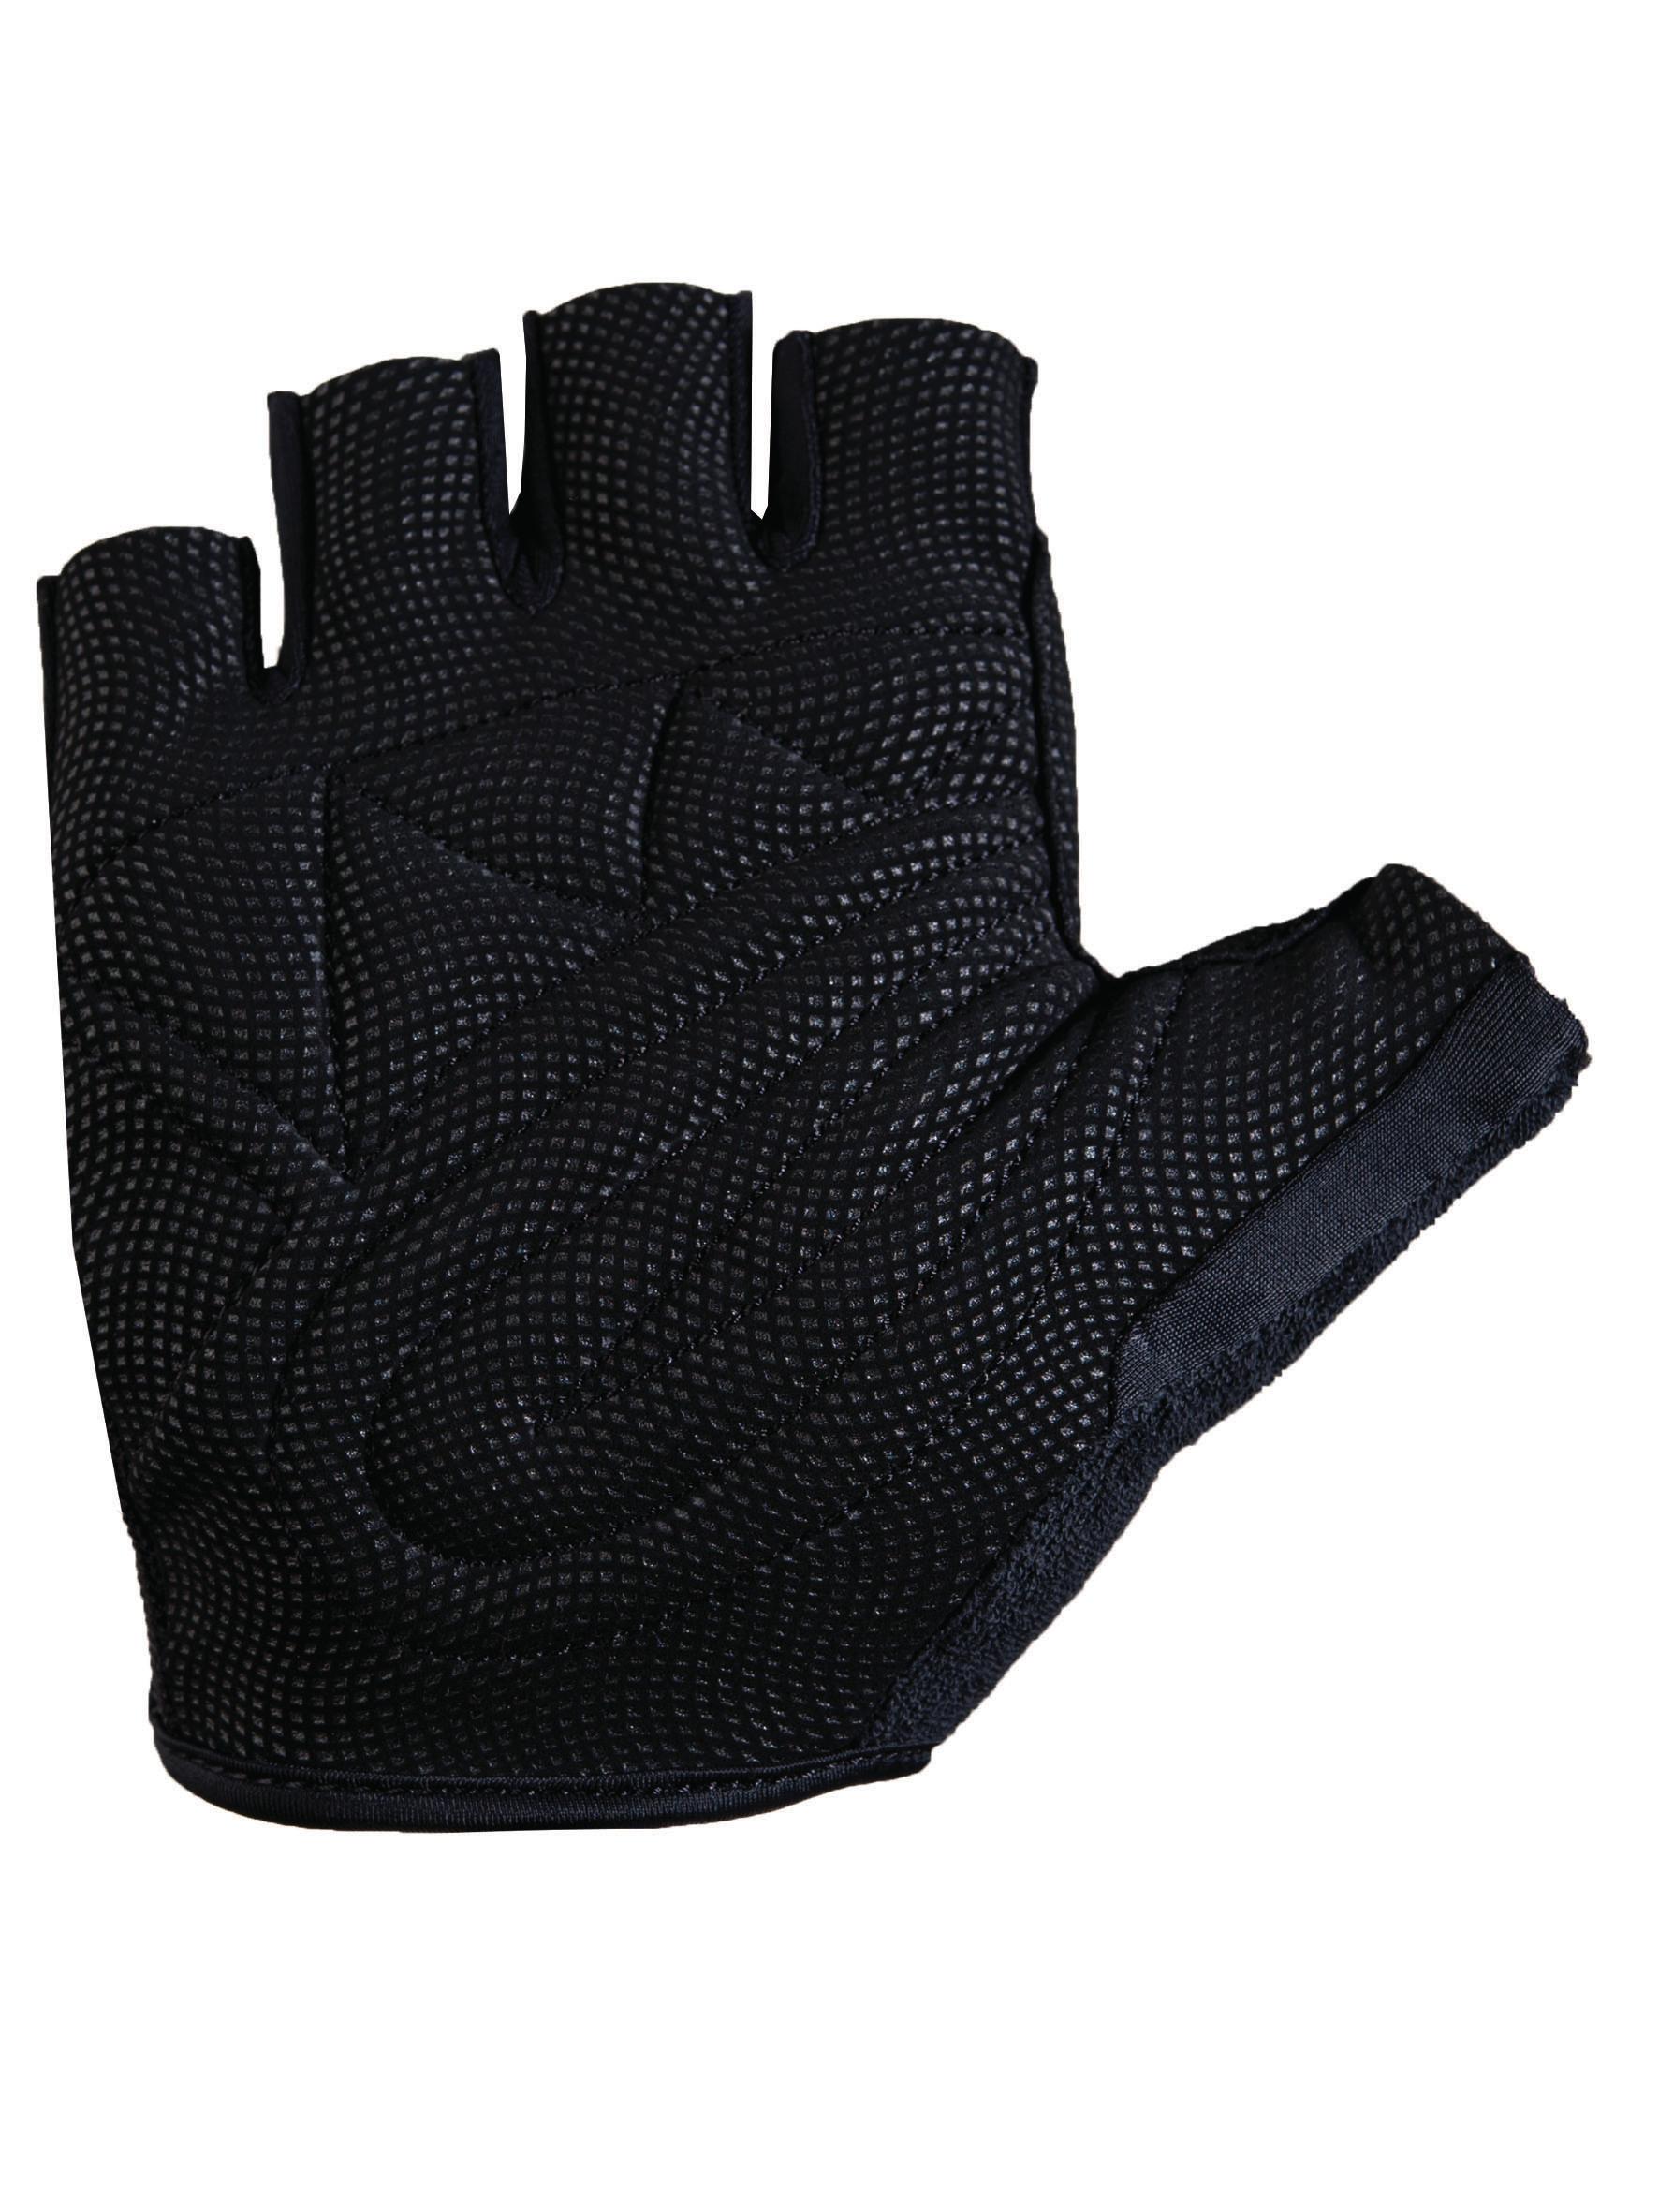 roeckl nelson fahrrad handschuhe kurz schwarz rot 2017. Black Bedroom Furniture Sets. Home Design Ideas